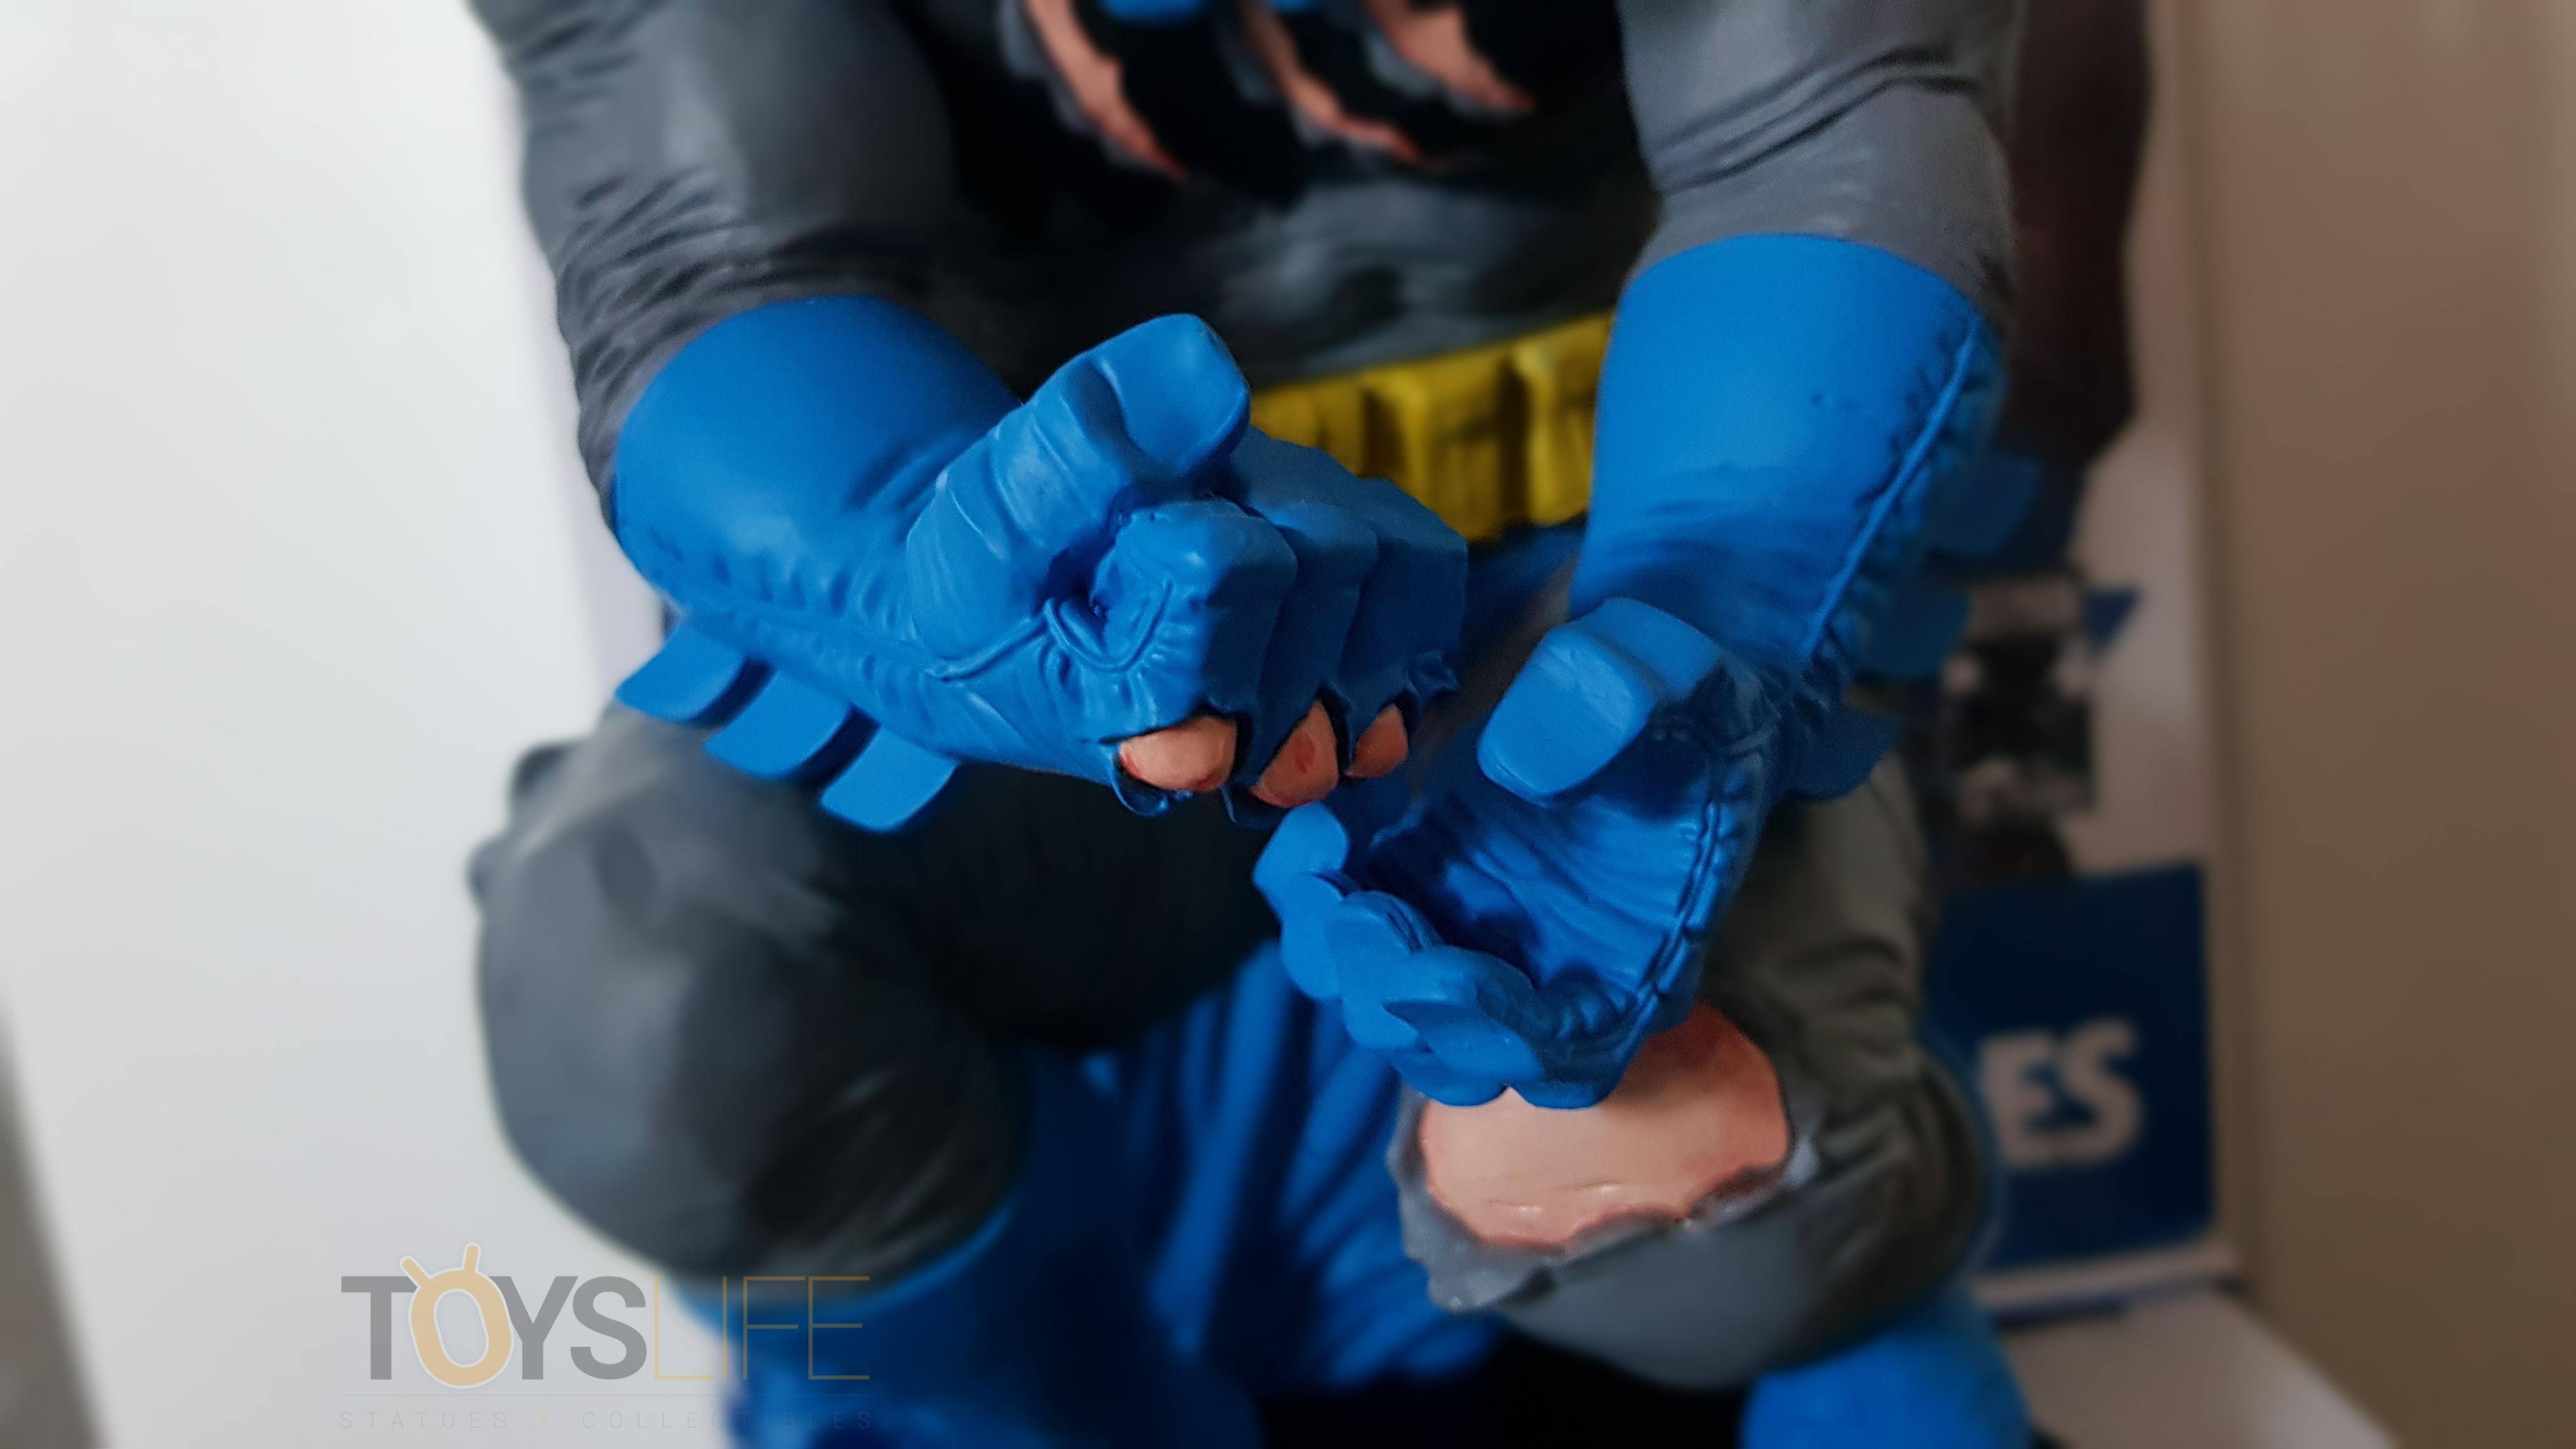 dc-designer-batman-by-frank-miller-statue-toyslife-review-08